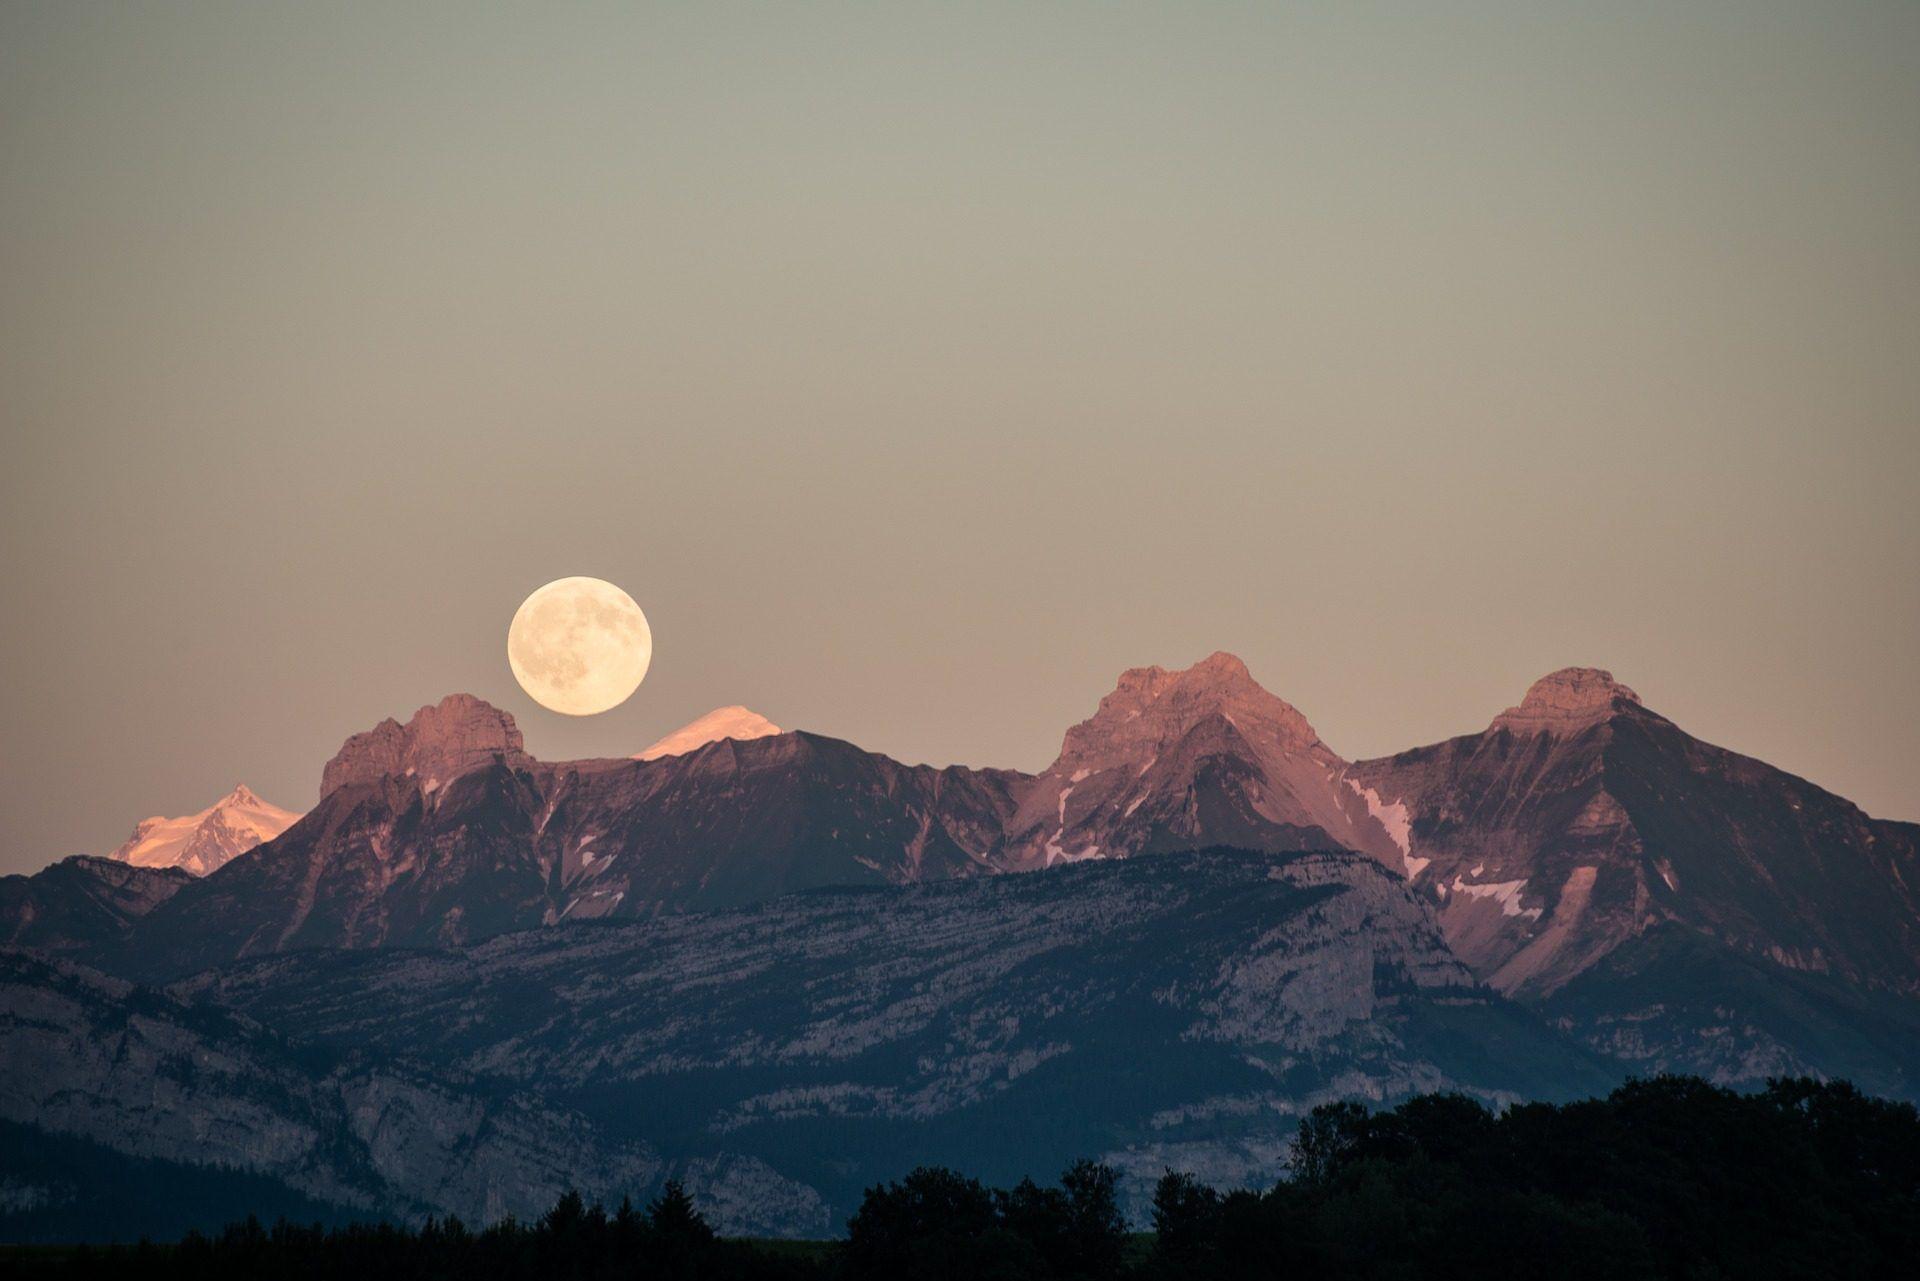 Fondo De Montañas Nevadas En Hd: Montañas, Nieve, Luna, Horizonte, Cielo, 1711190855